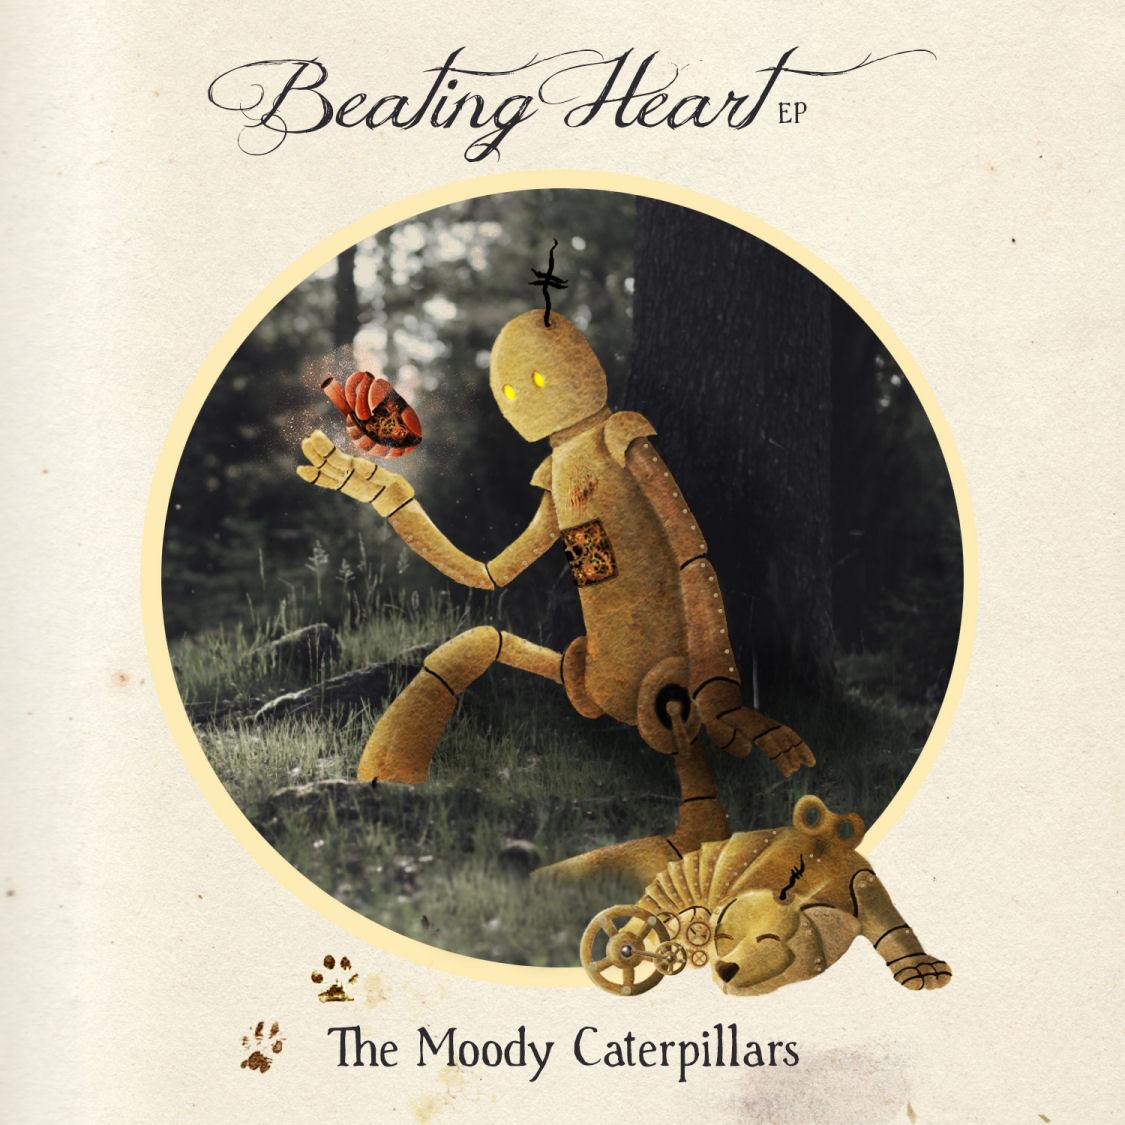 The Moody Caterpillars – Beating Heart